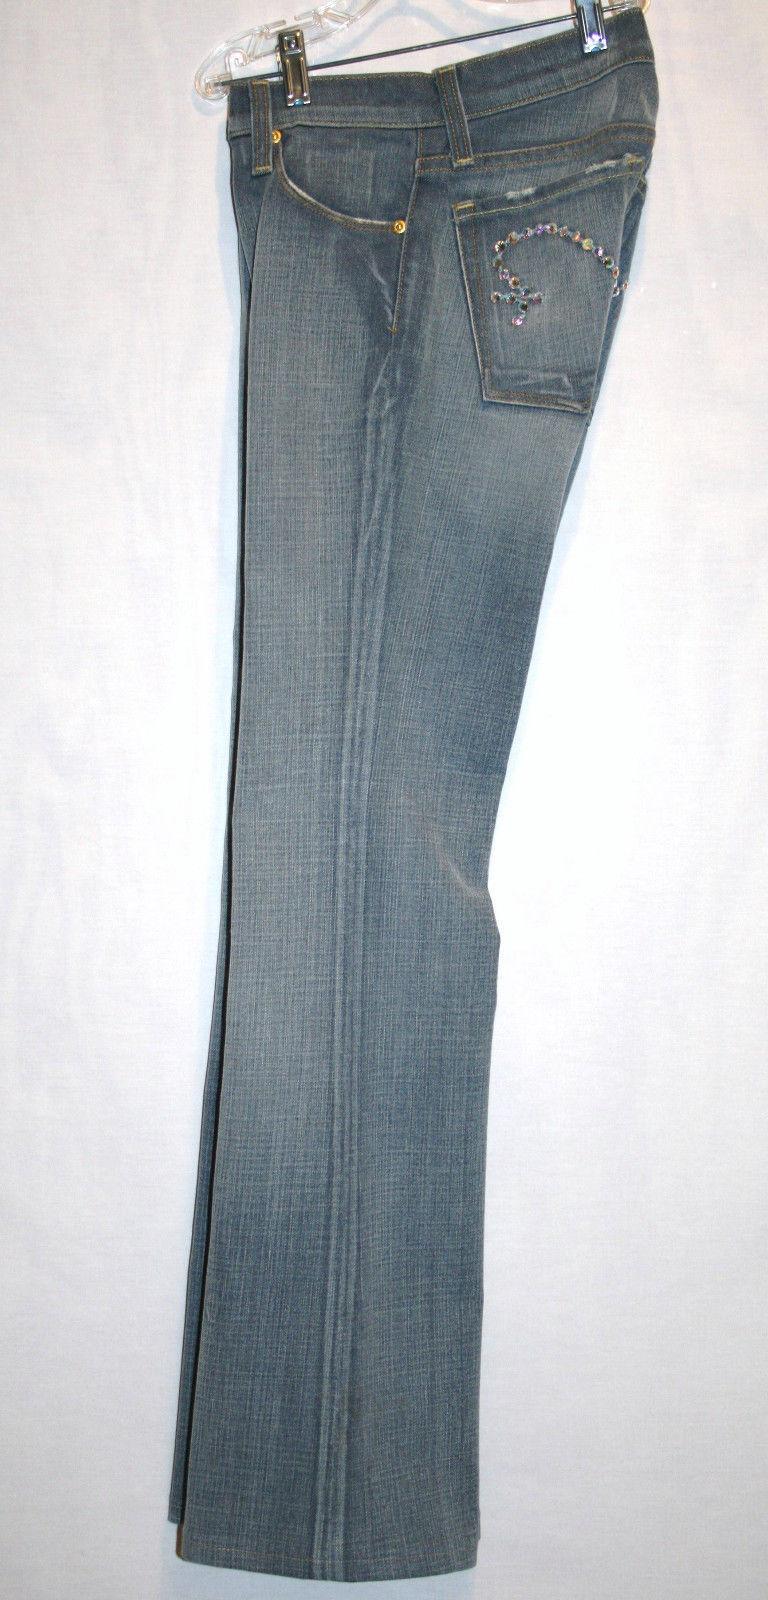 LIVE LIFE KRISTOFI 101 Boot Cut Aurora Boreallis Crystal Jeans Size 25   #632